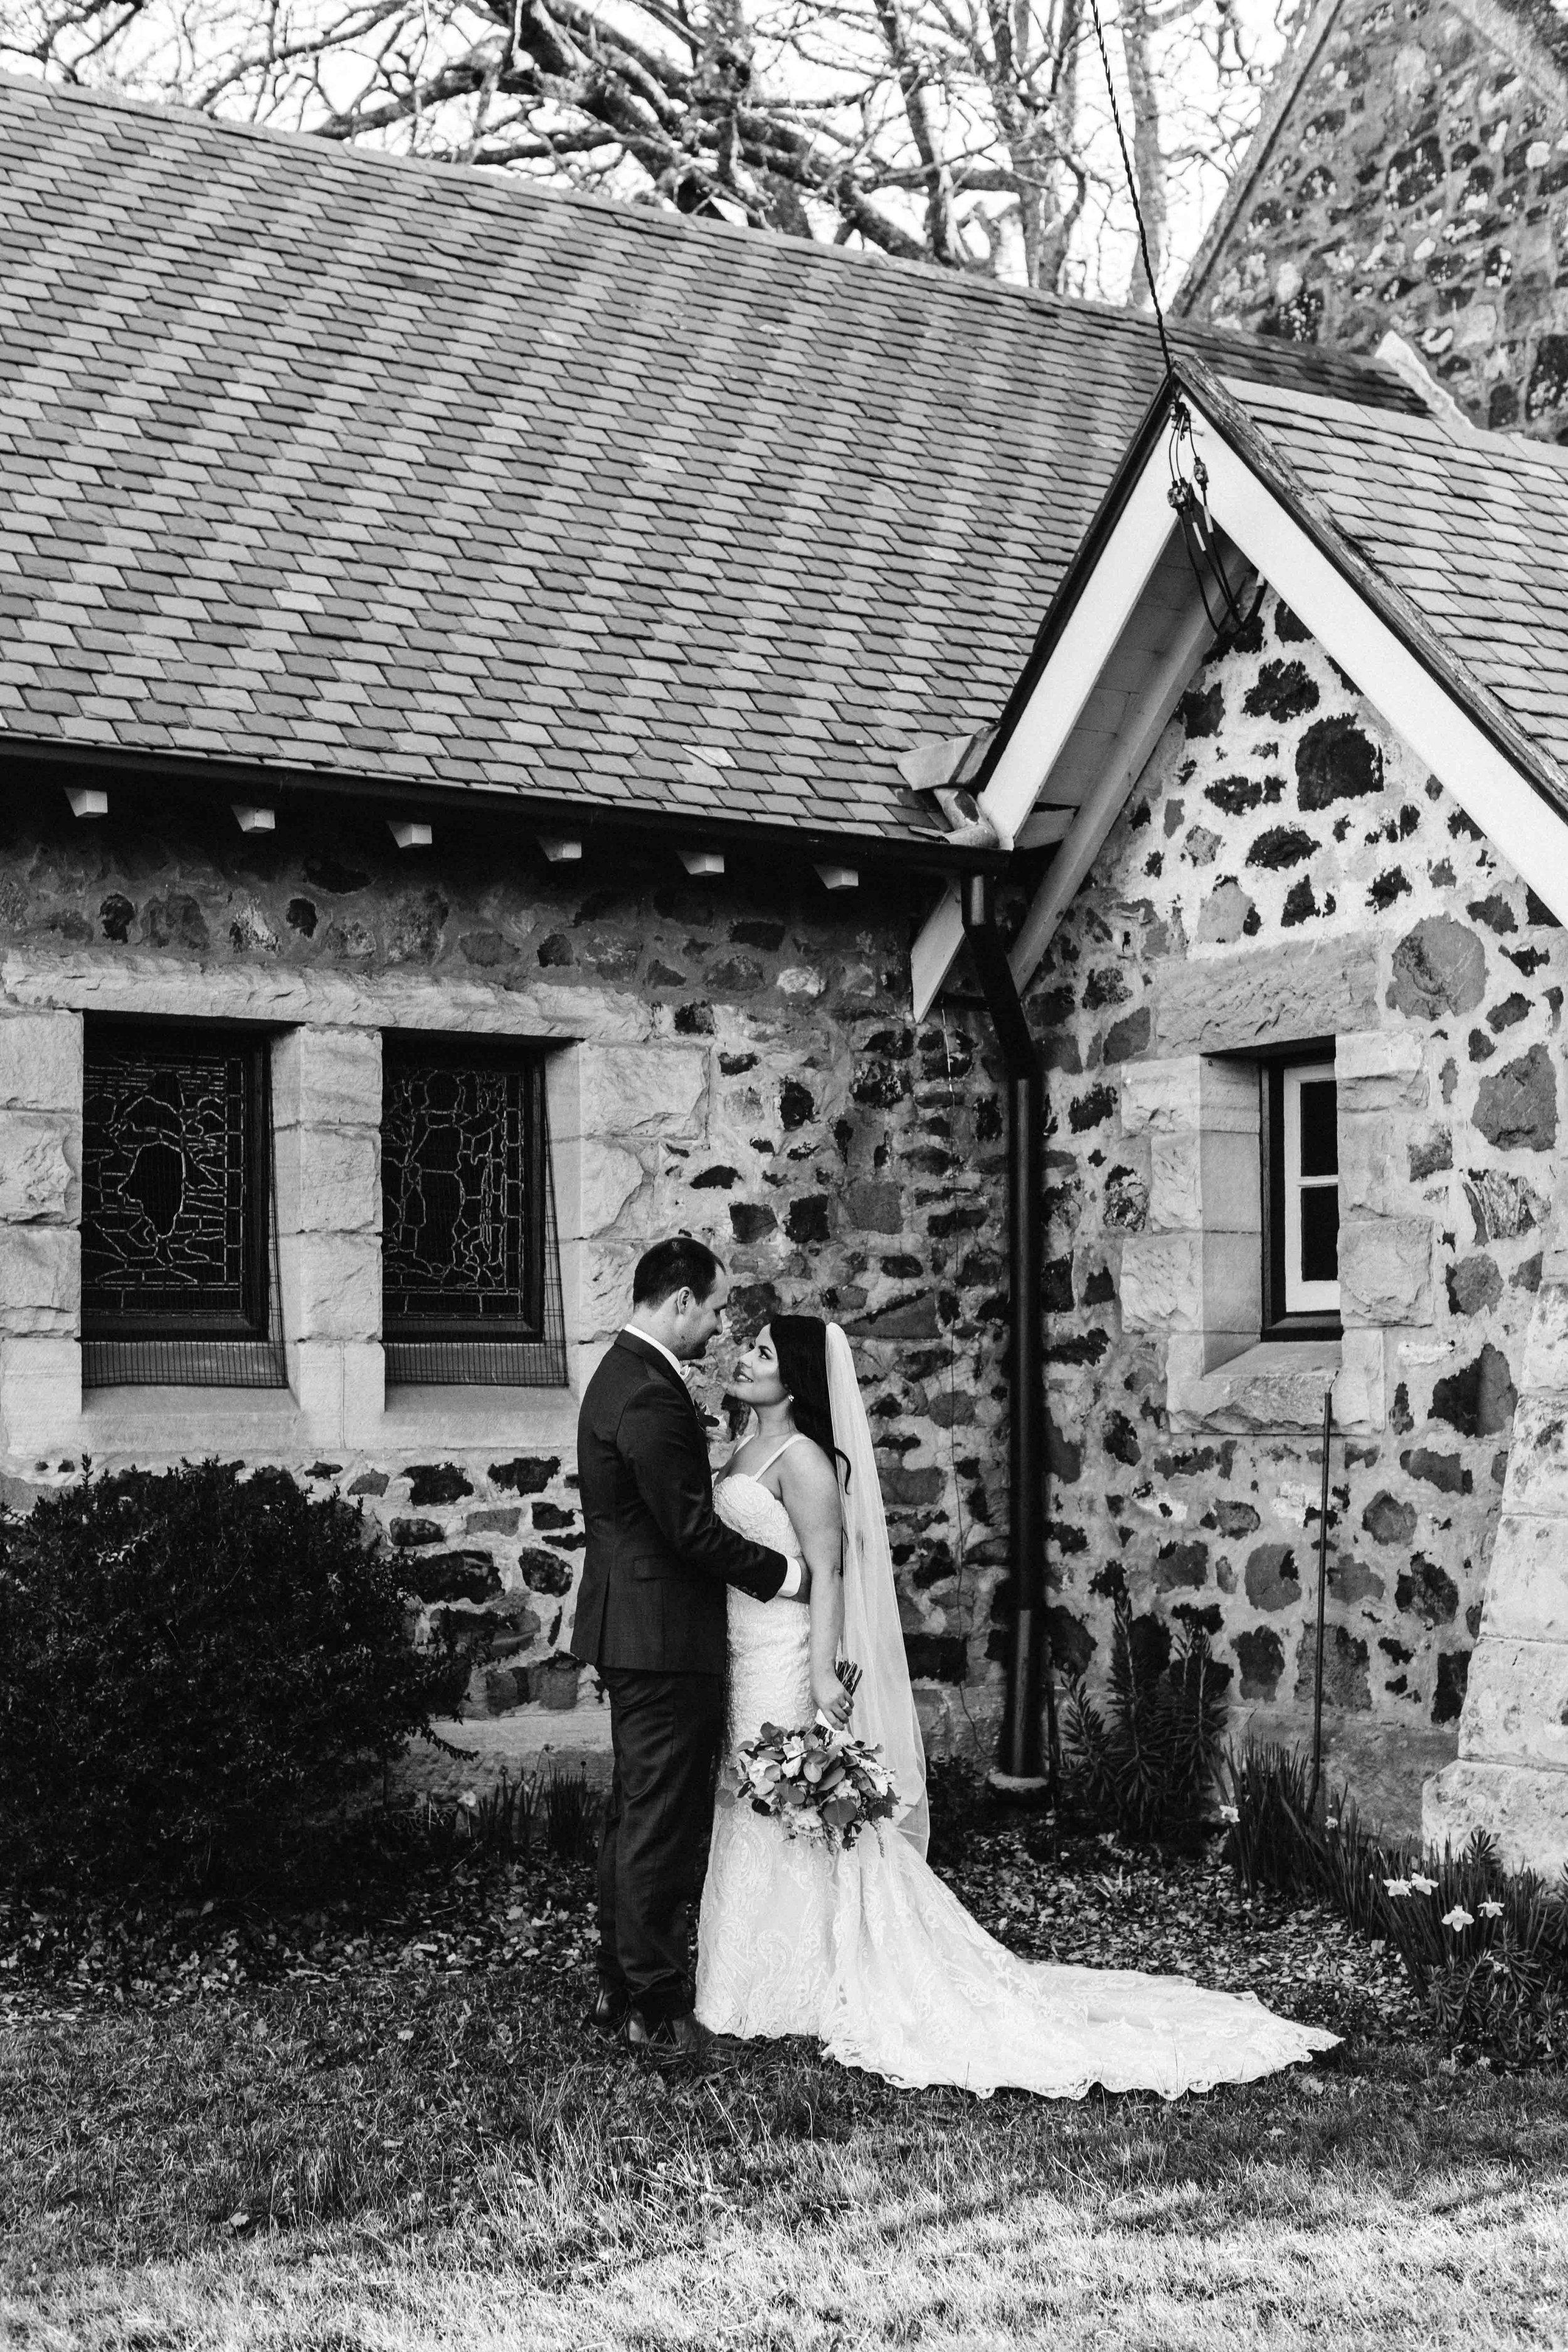 exeter-southern-highlands-wedding-www.emilyobrienphotography.net -101.jpg